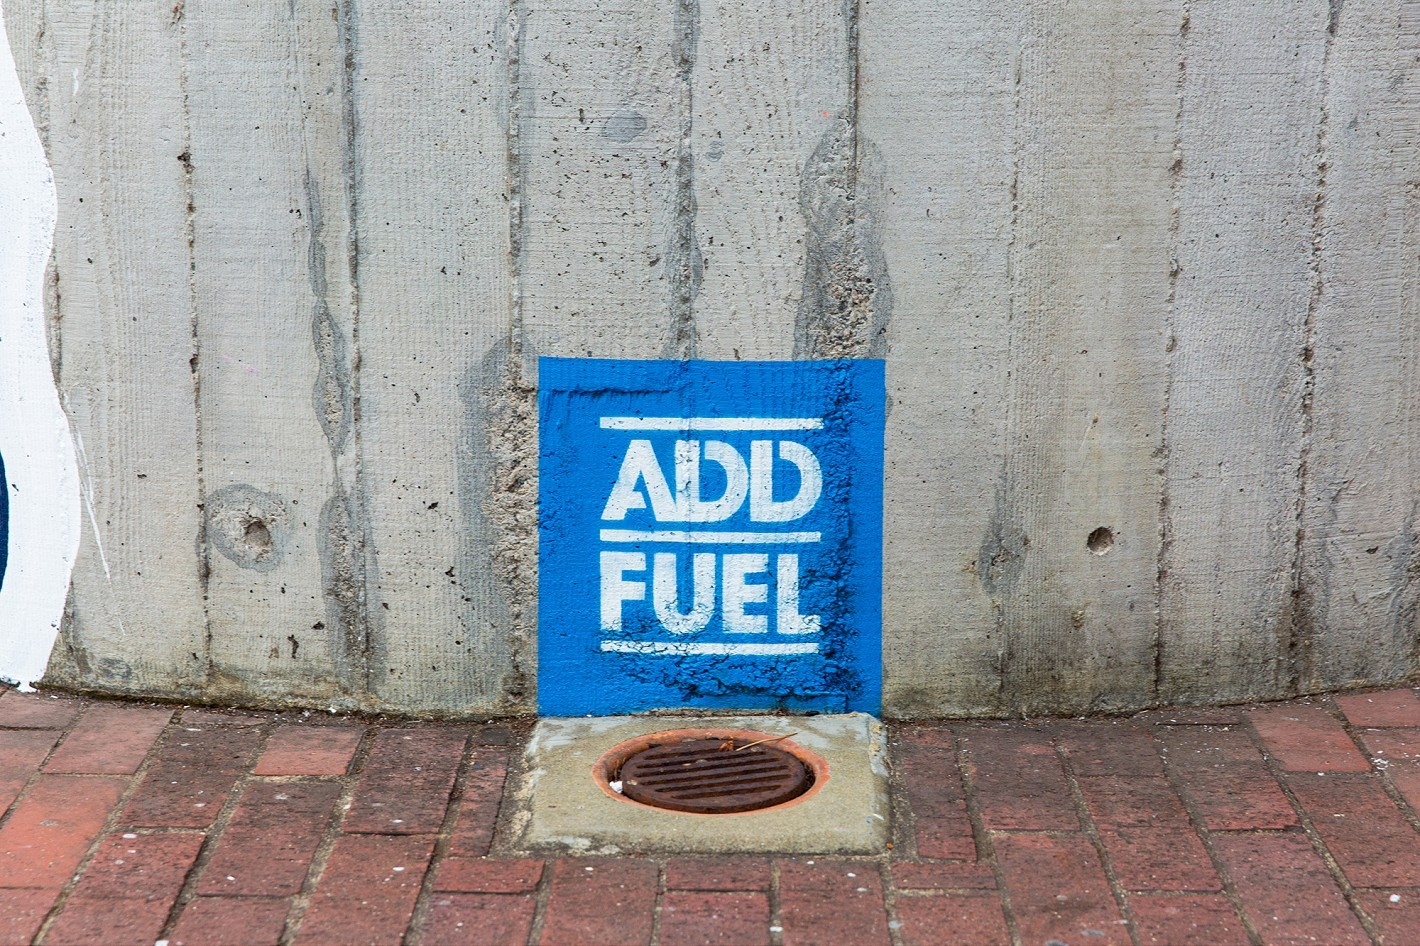 Add_Fuel_UPWARDS_DESCENT_PUBLIC2016_Australia_05